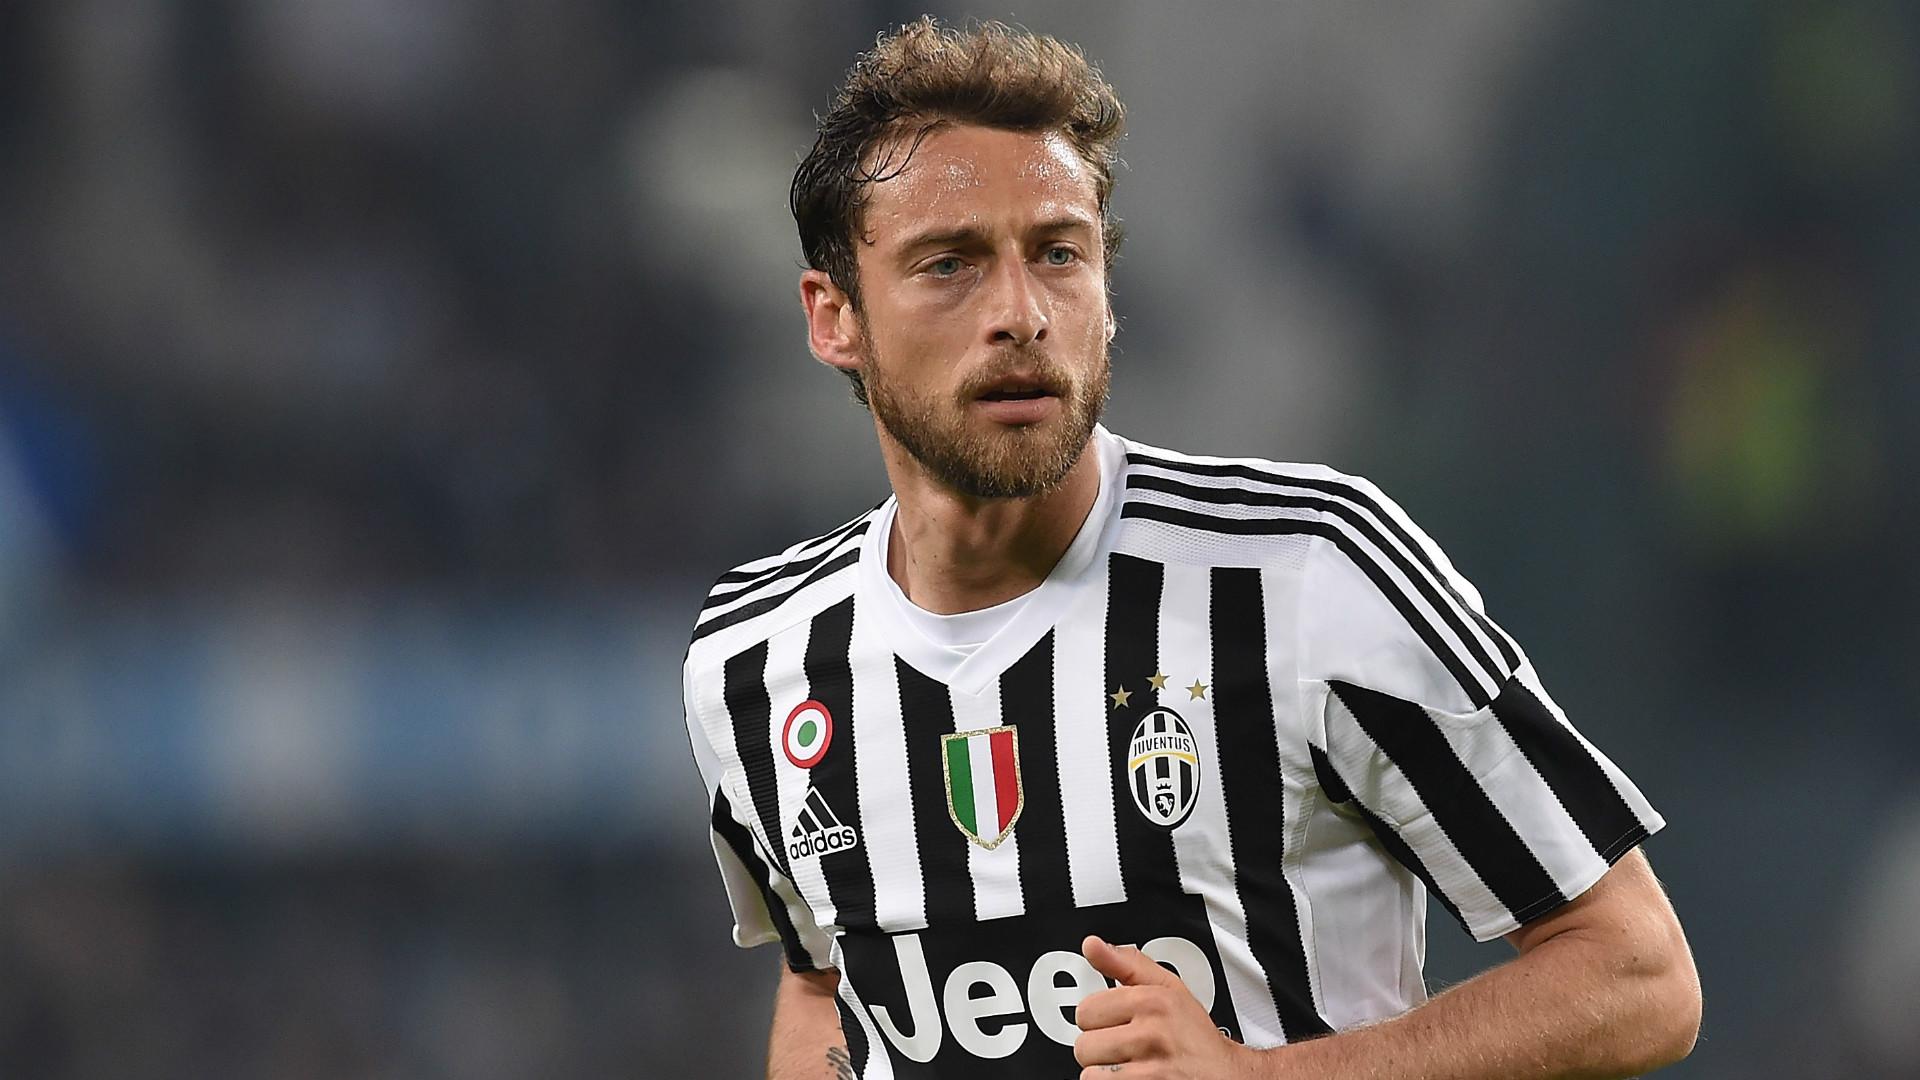 Juventus News: ritorna Marchisio, vice Buffon e Khedira-Goal